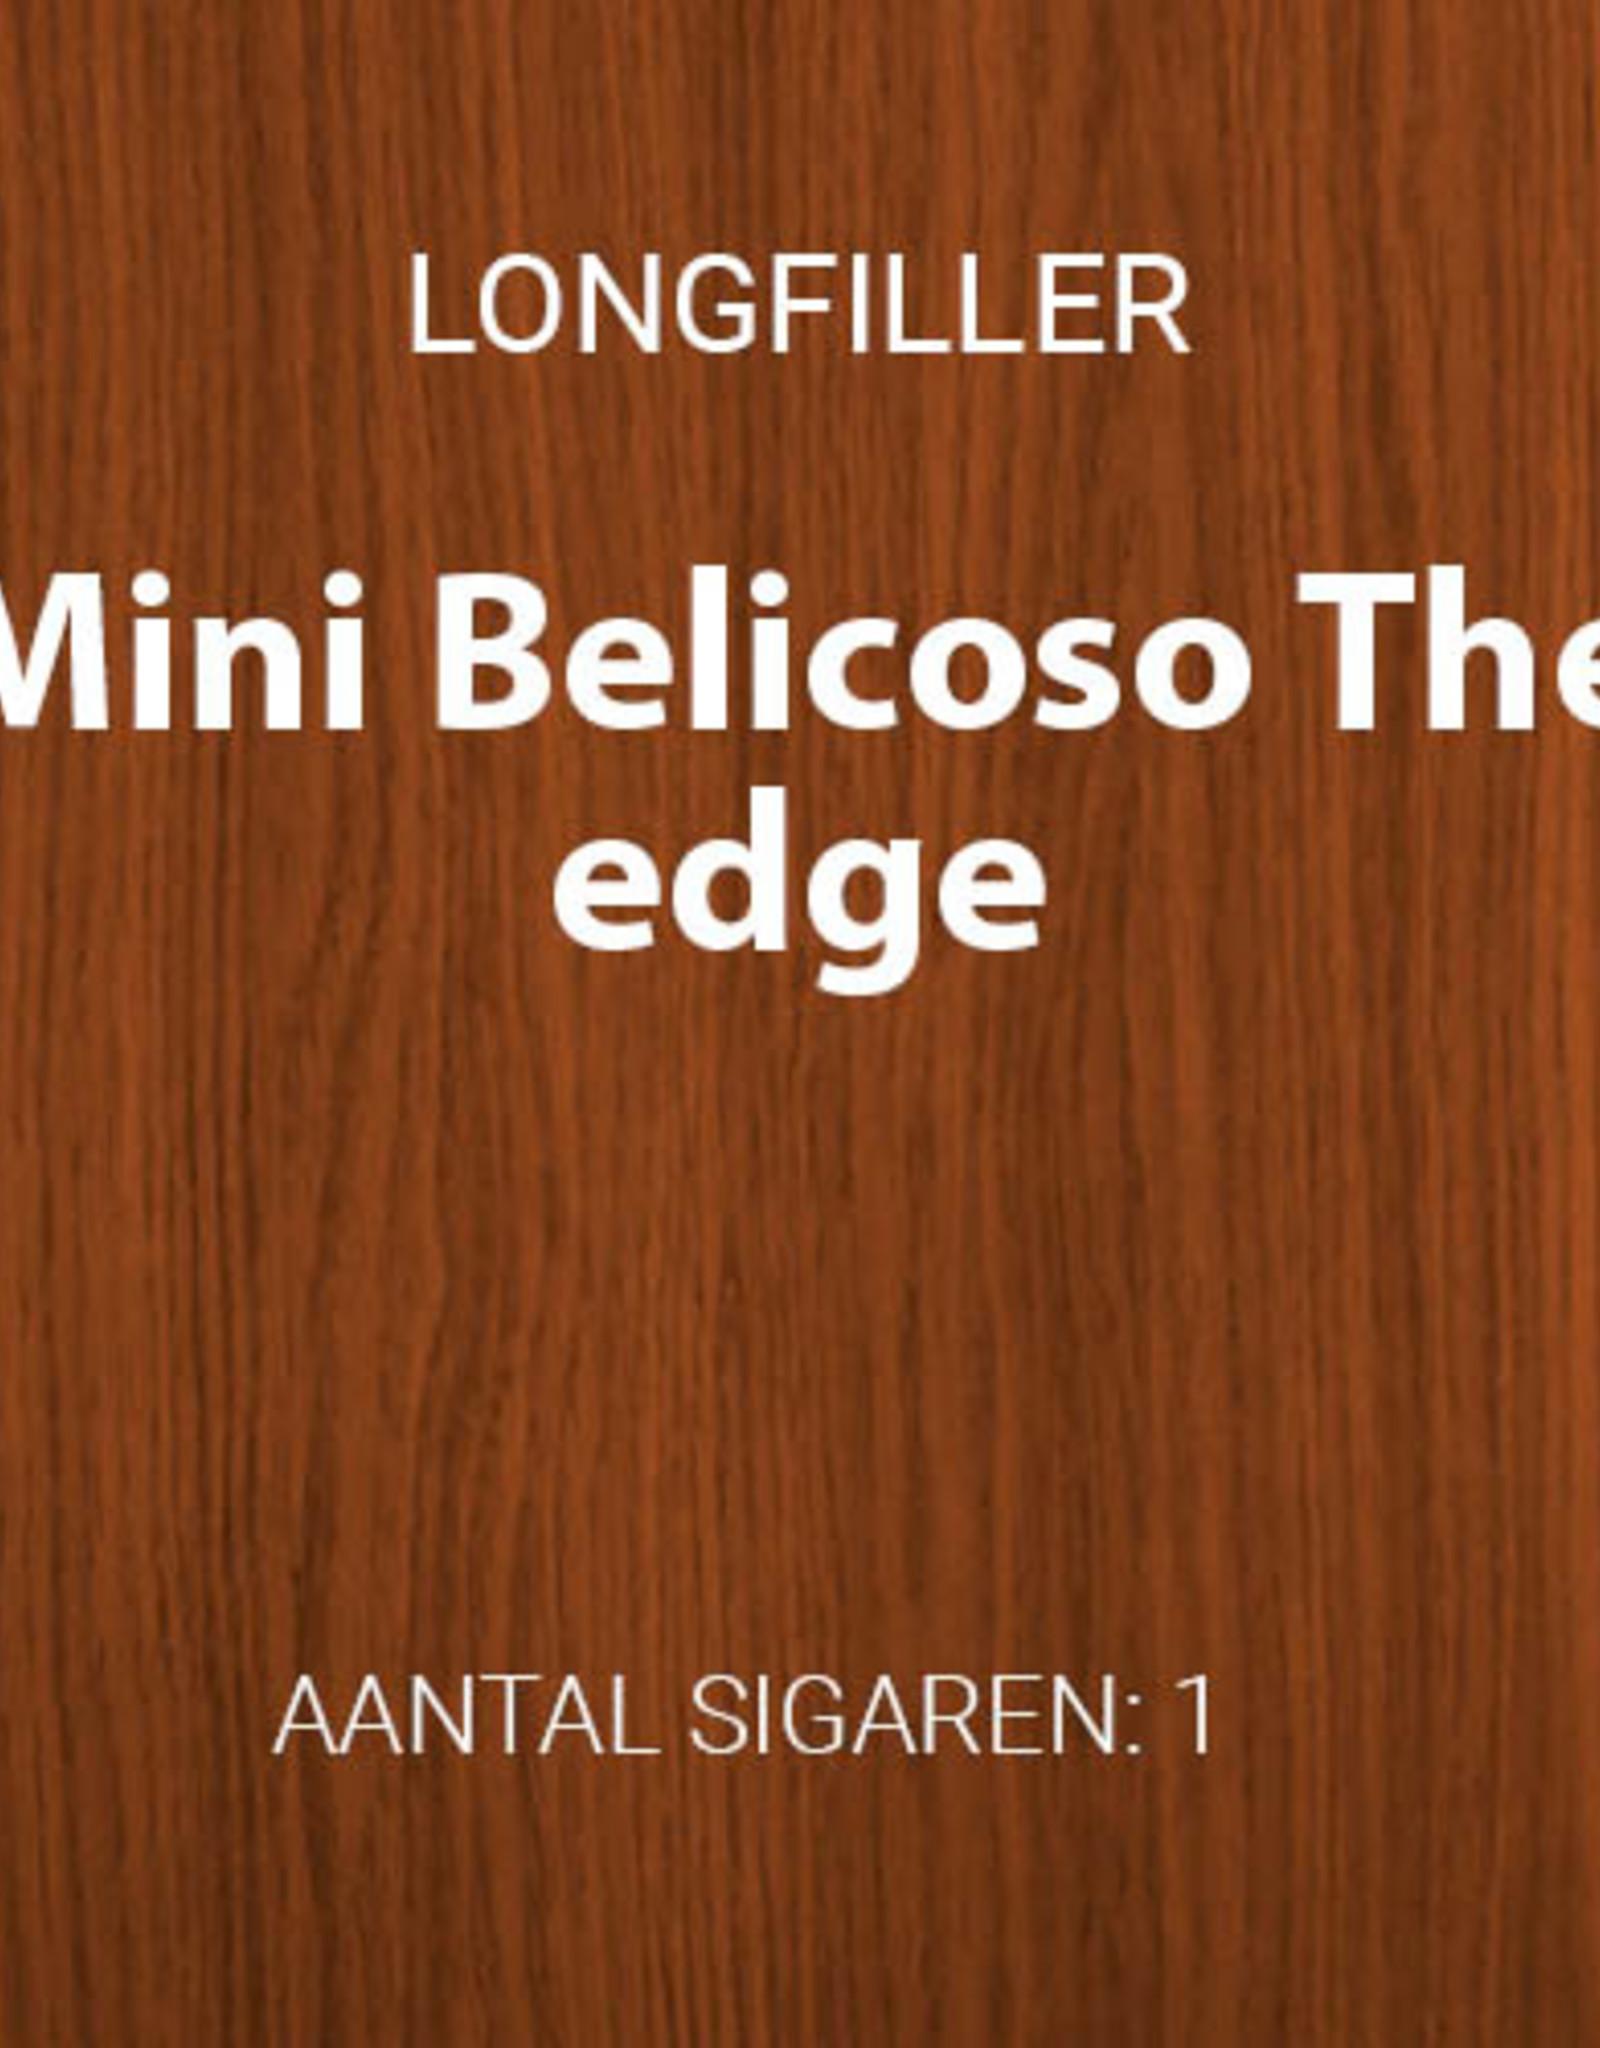 Mini Belicoso The Edge